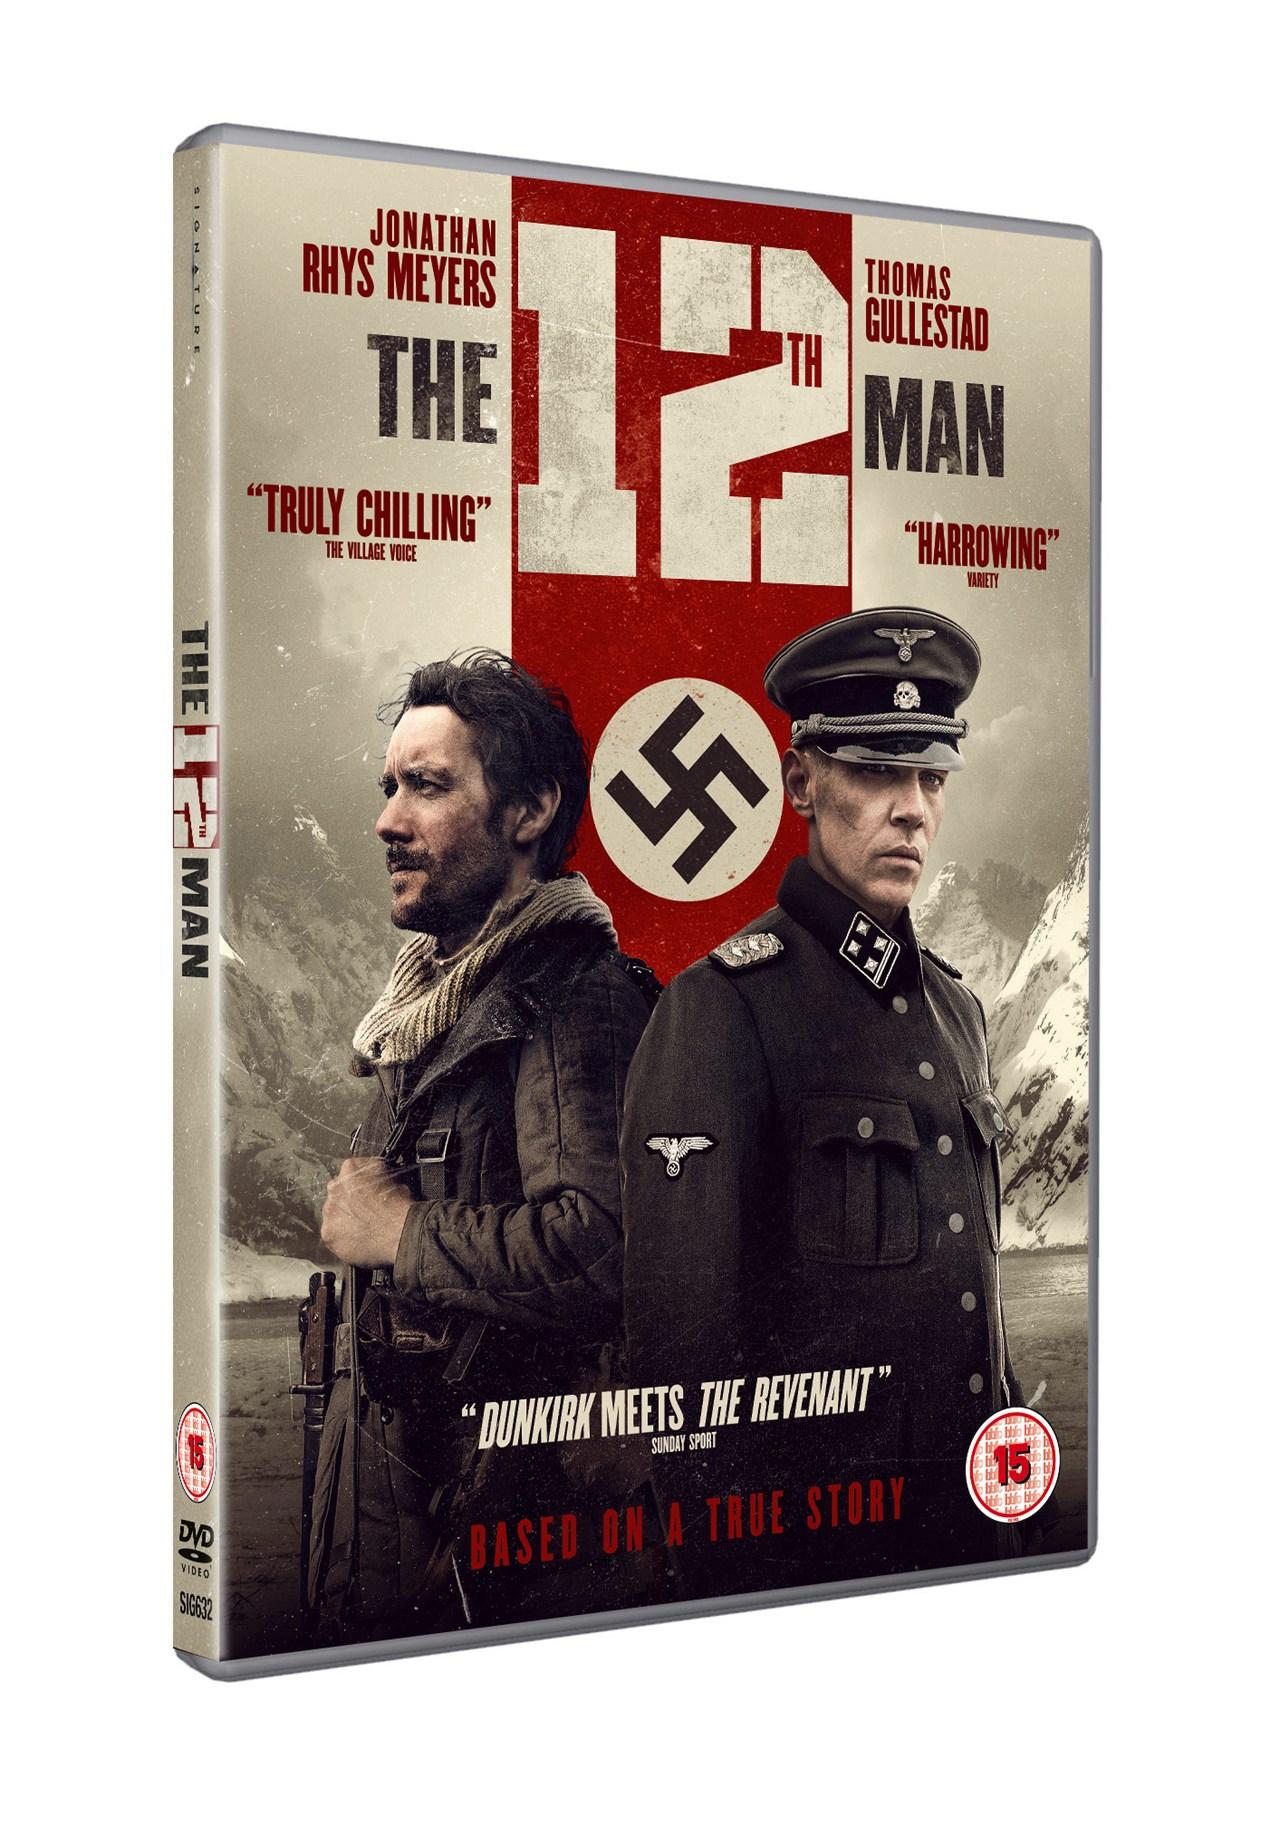 The 12th Man - 2